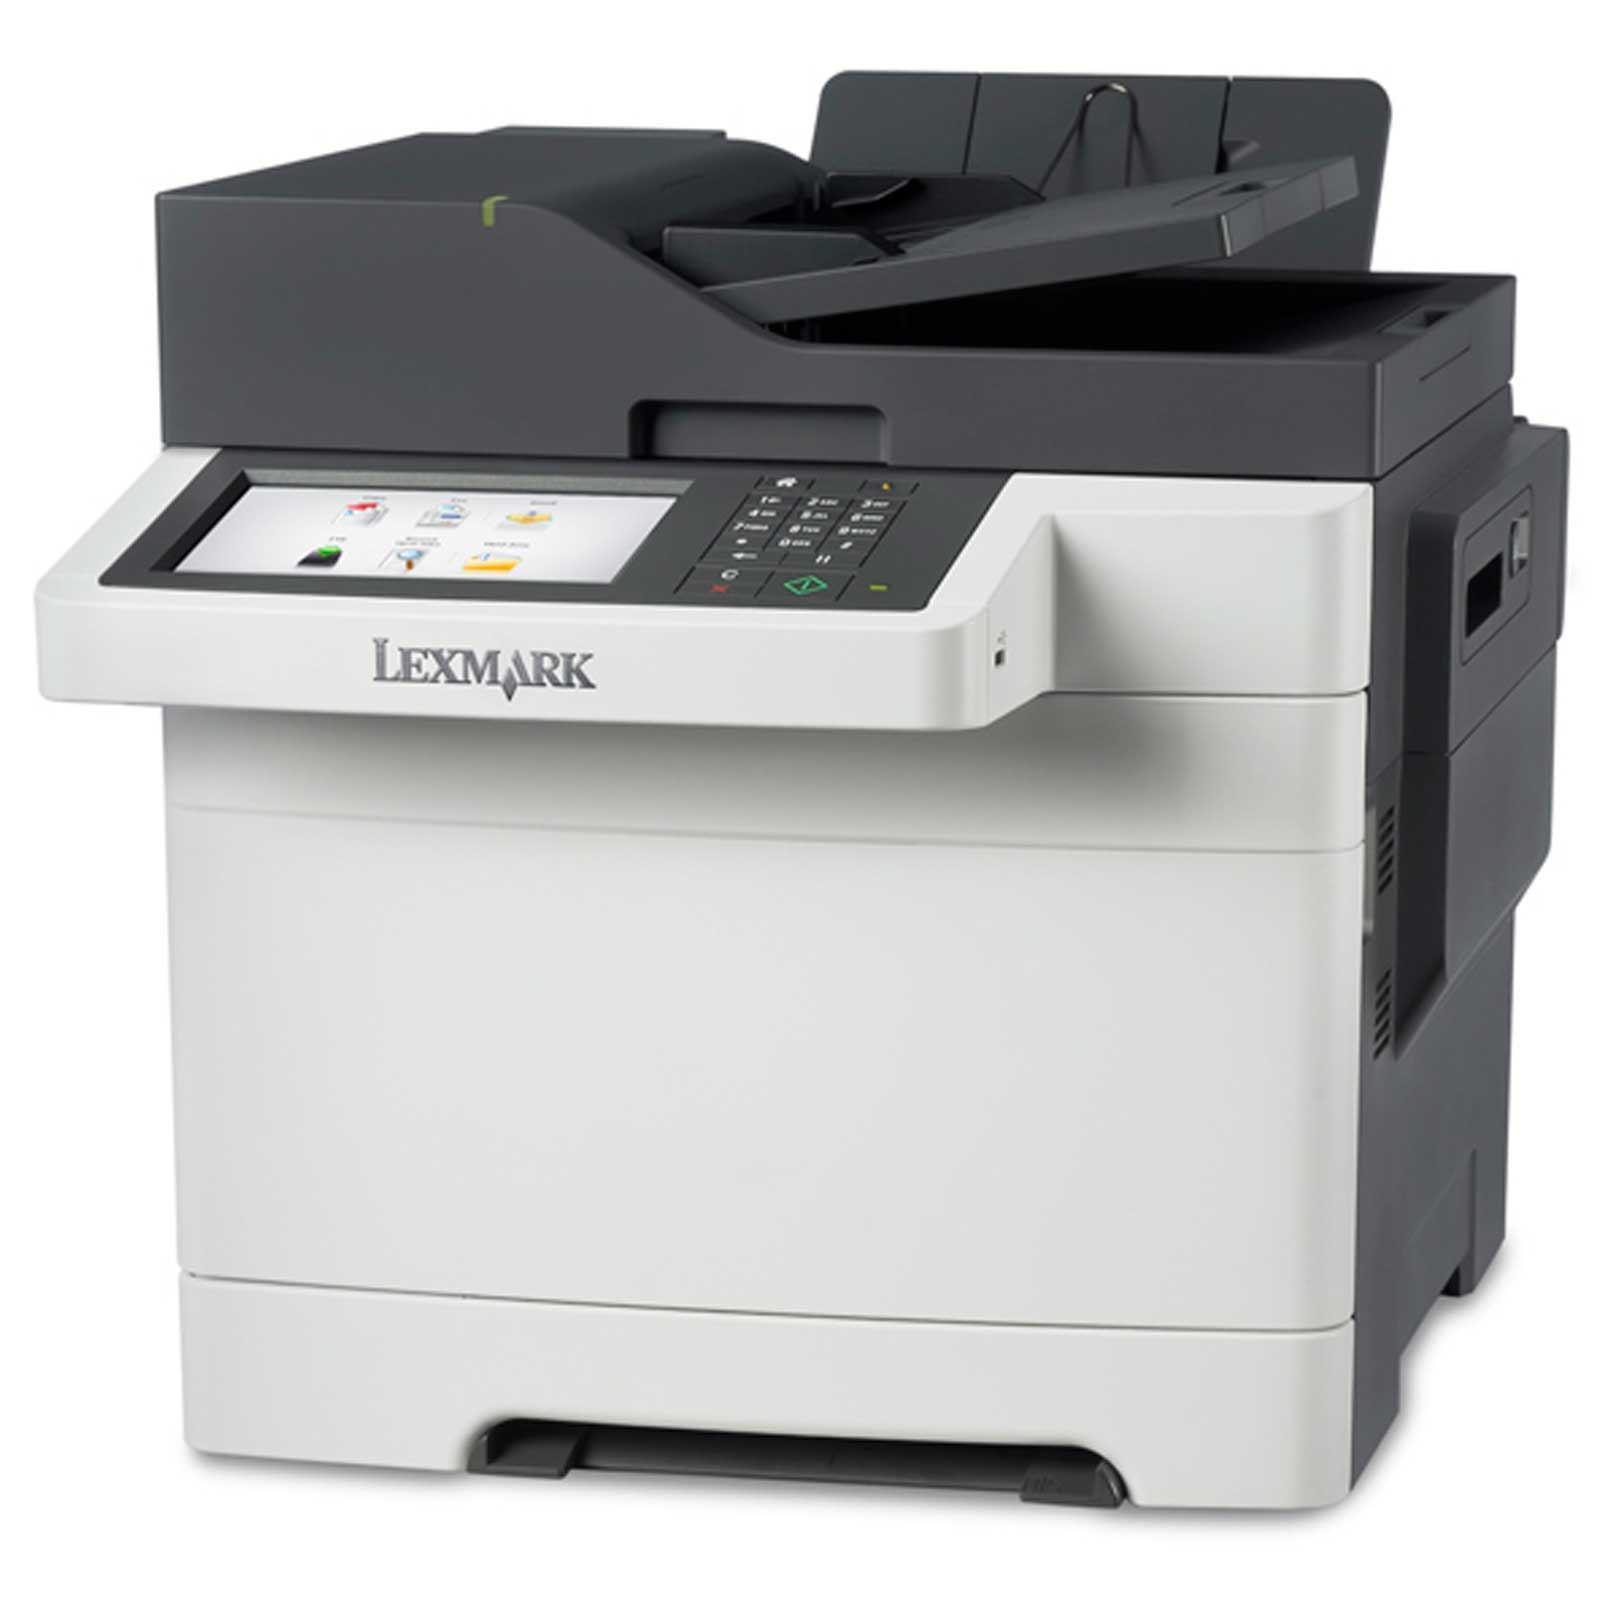 LEXMARK tiskárna CX510de A4 COLOR LASER, 30ppm, 1024MB USB, LAN, duplex, dotykový LCD